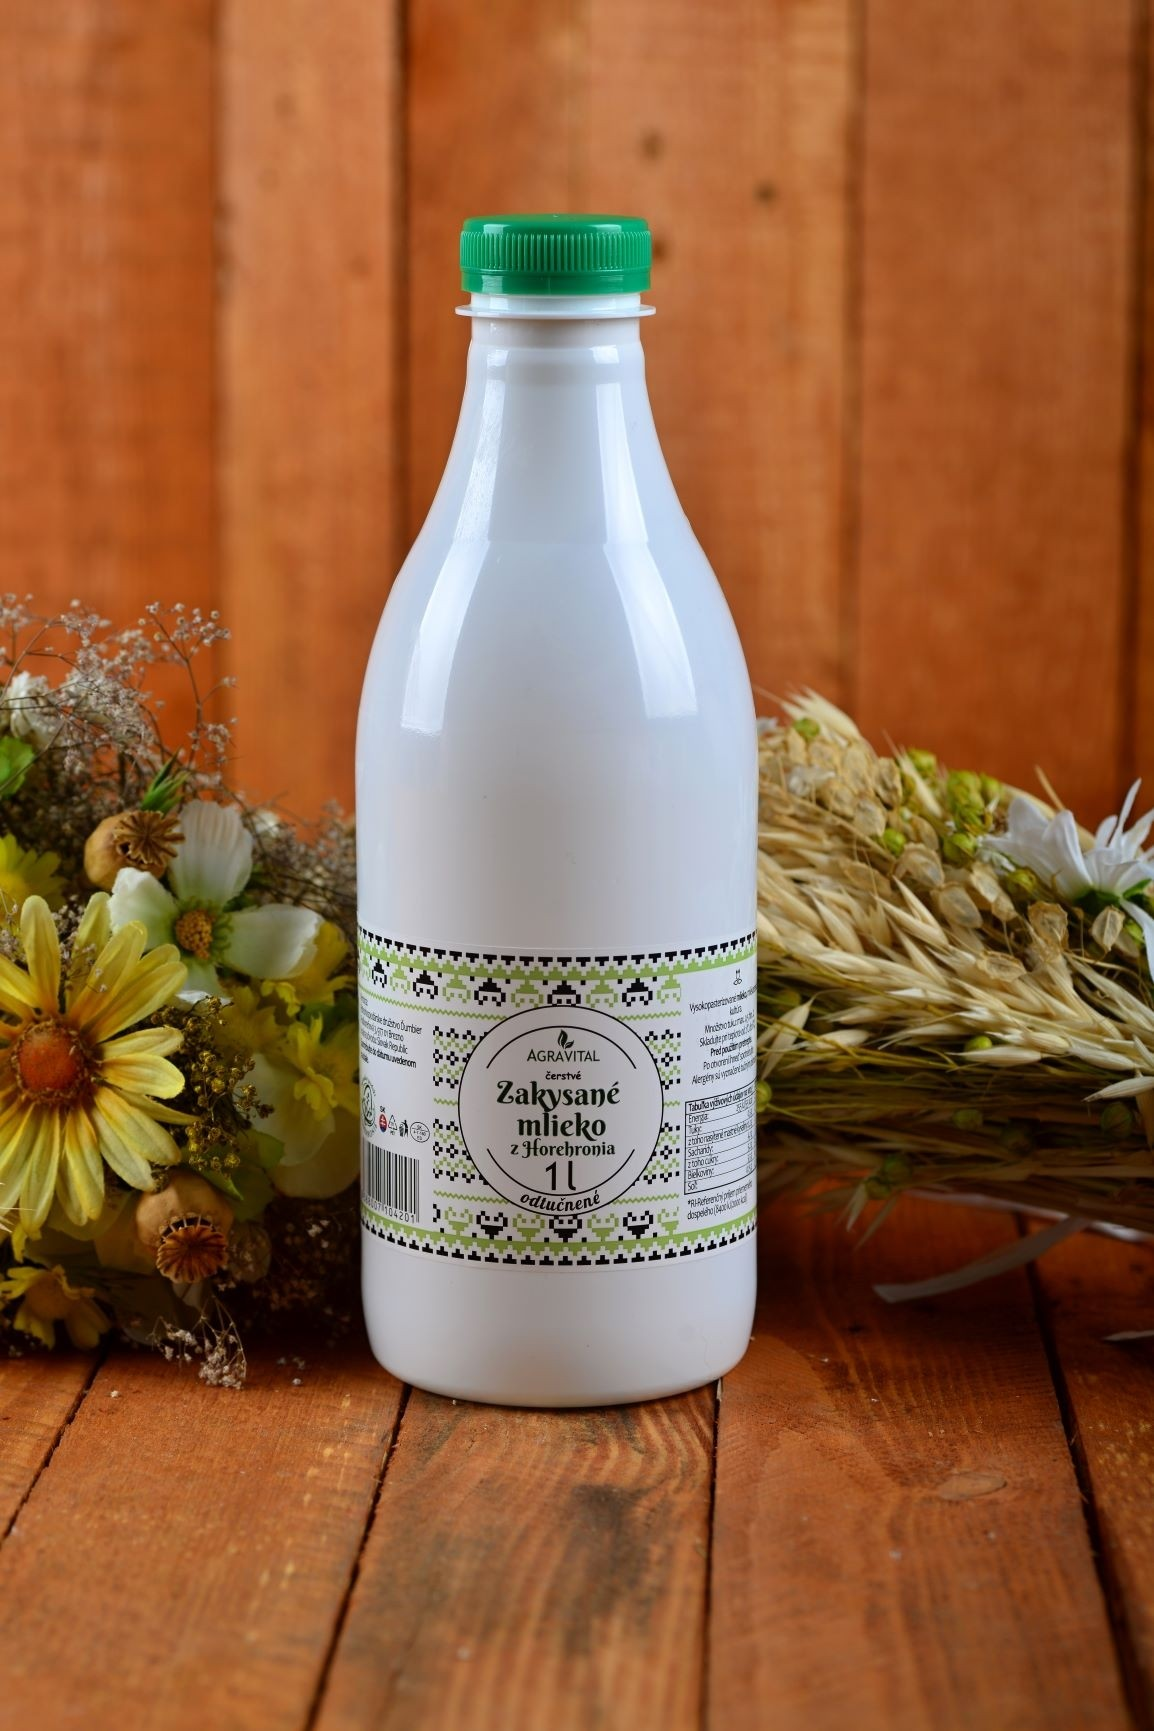 Zakysané mlieko